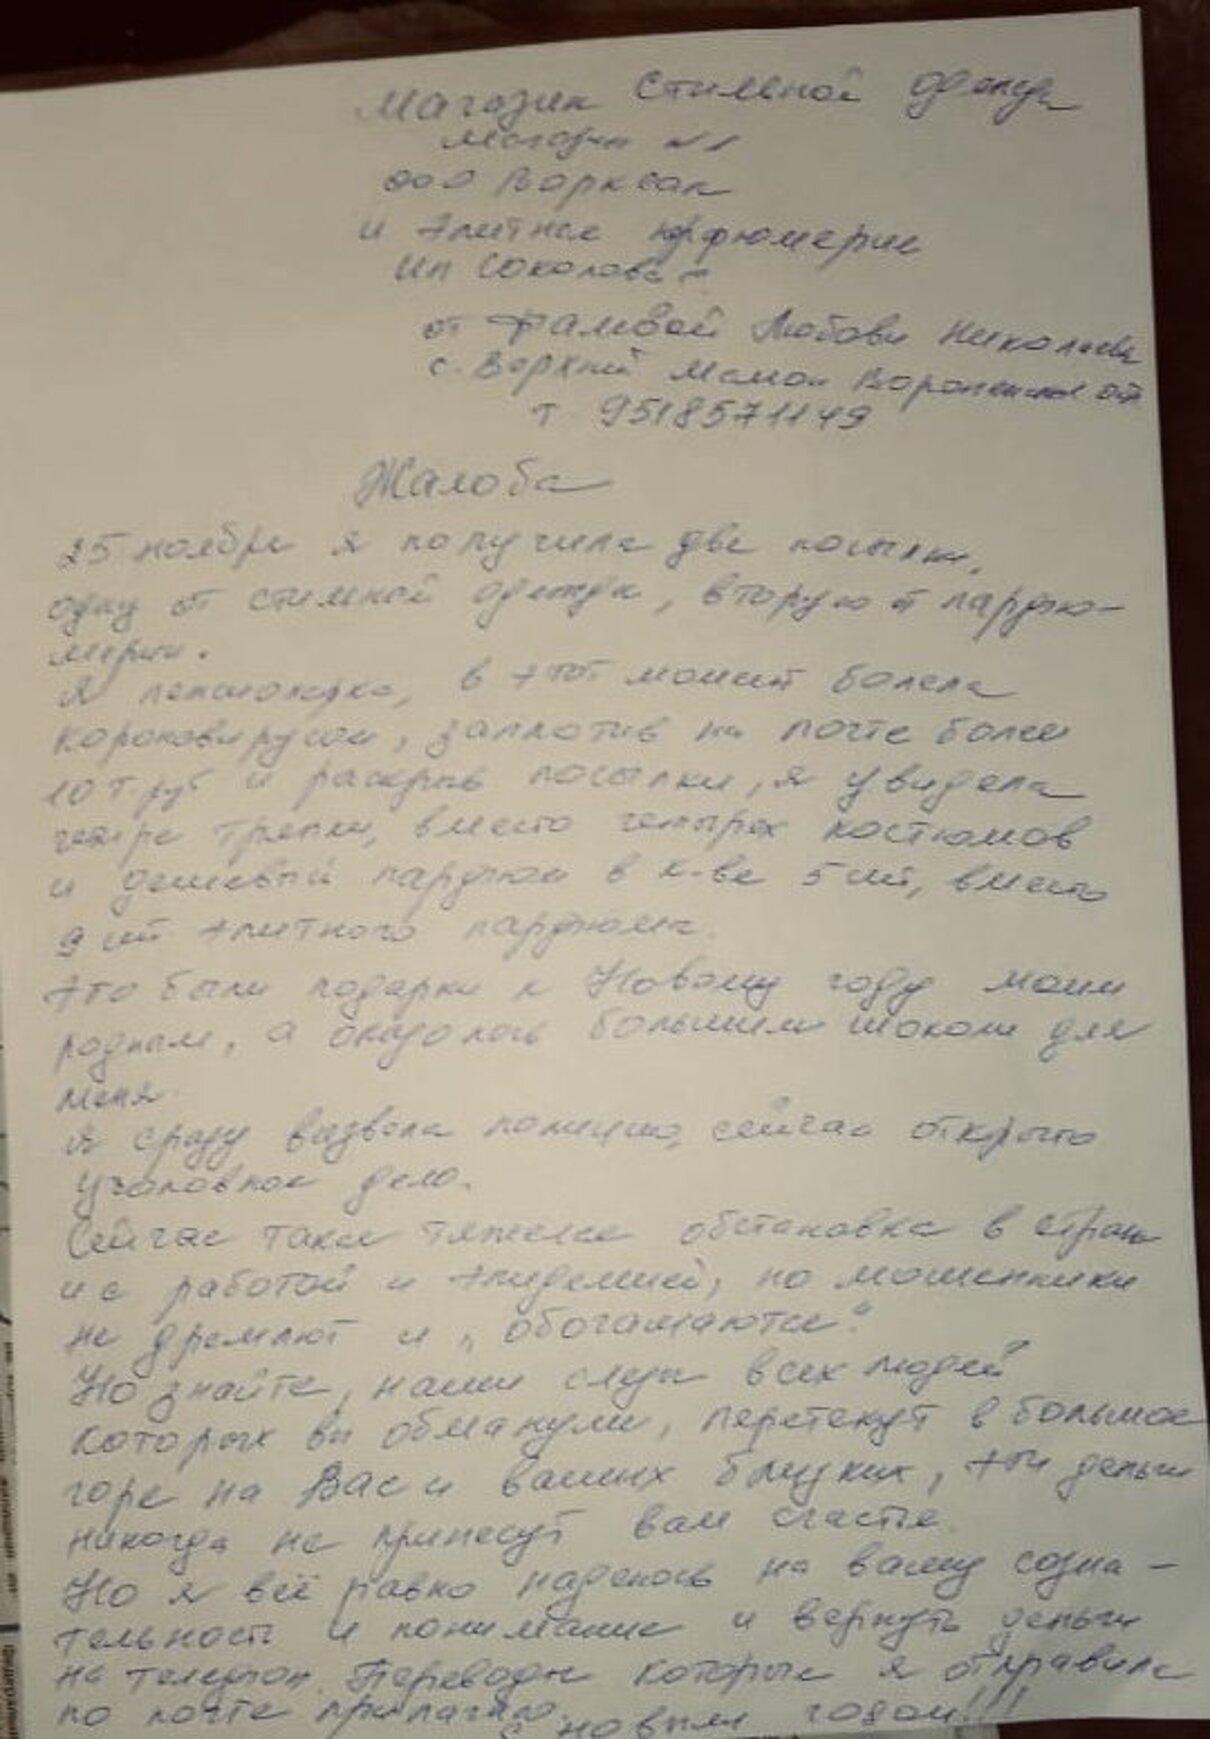 Жалоба-отзыв: Http://granddiscount.ru - Мошенники.  Фото №1